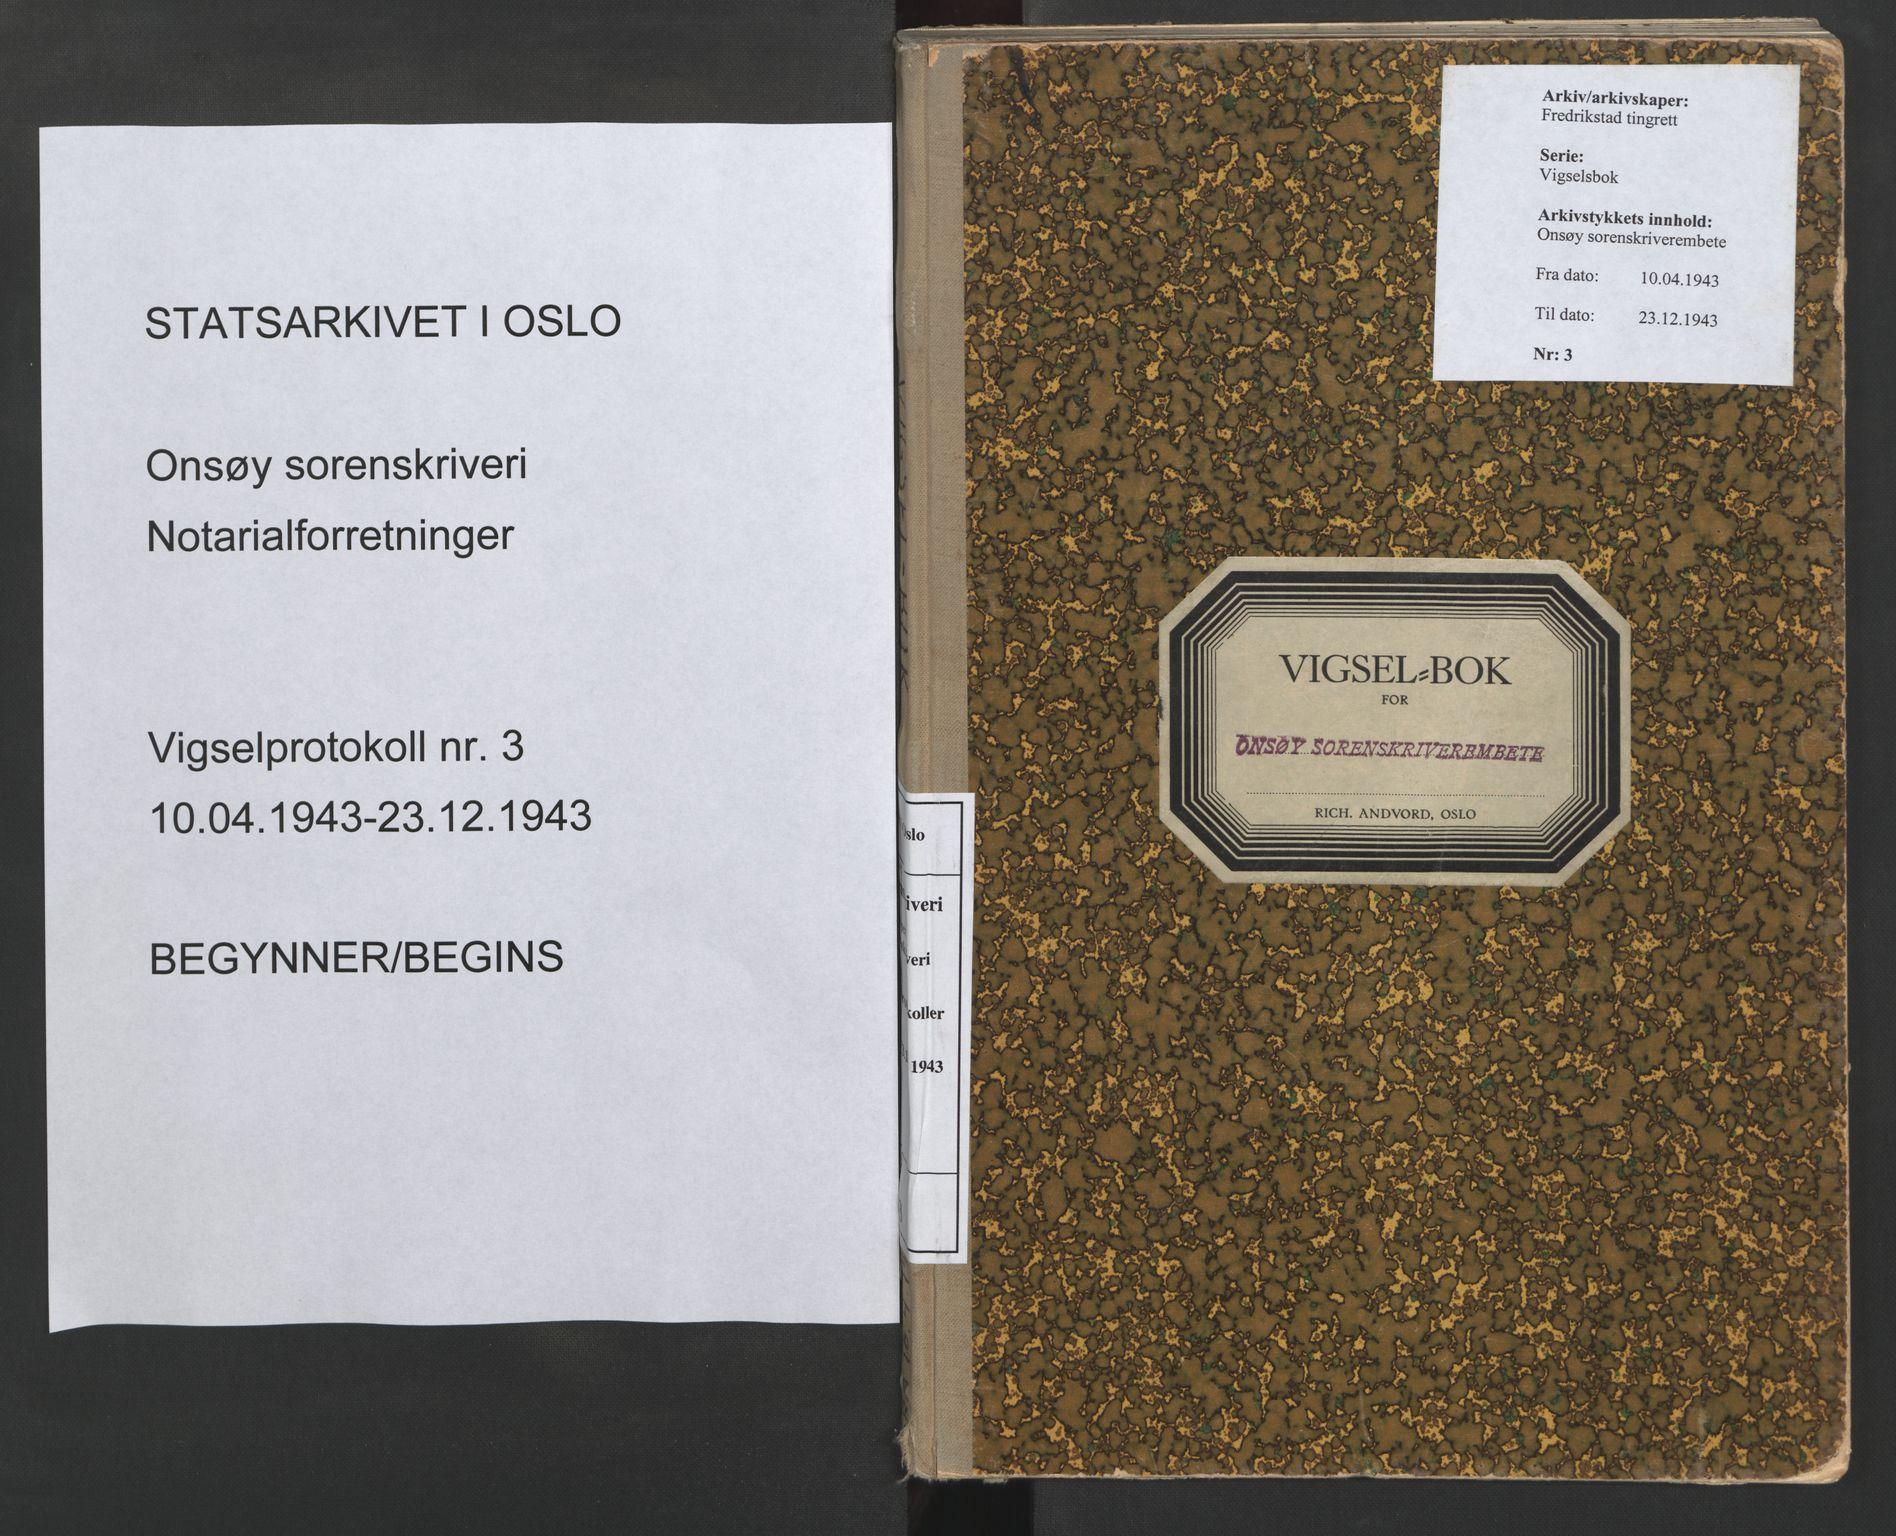 SAO, Onsøy sorenskriveri, L/La/L0003: Vigselsbok, 1943, s. upaginert